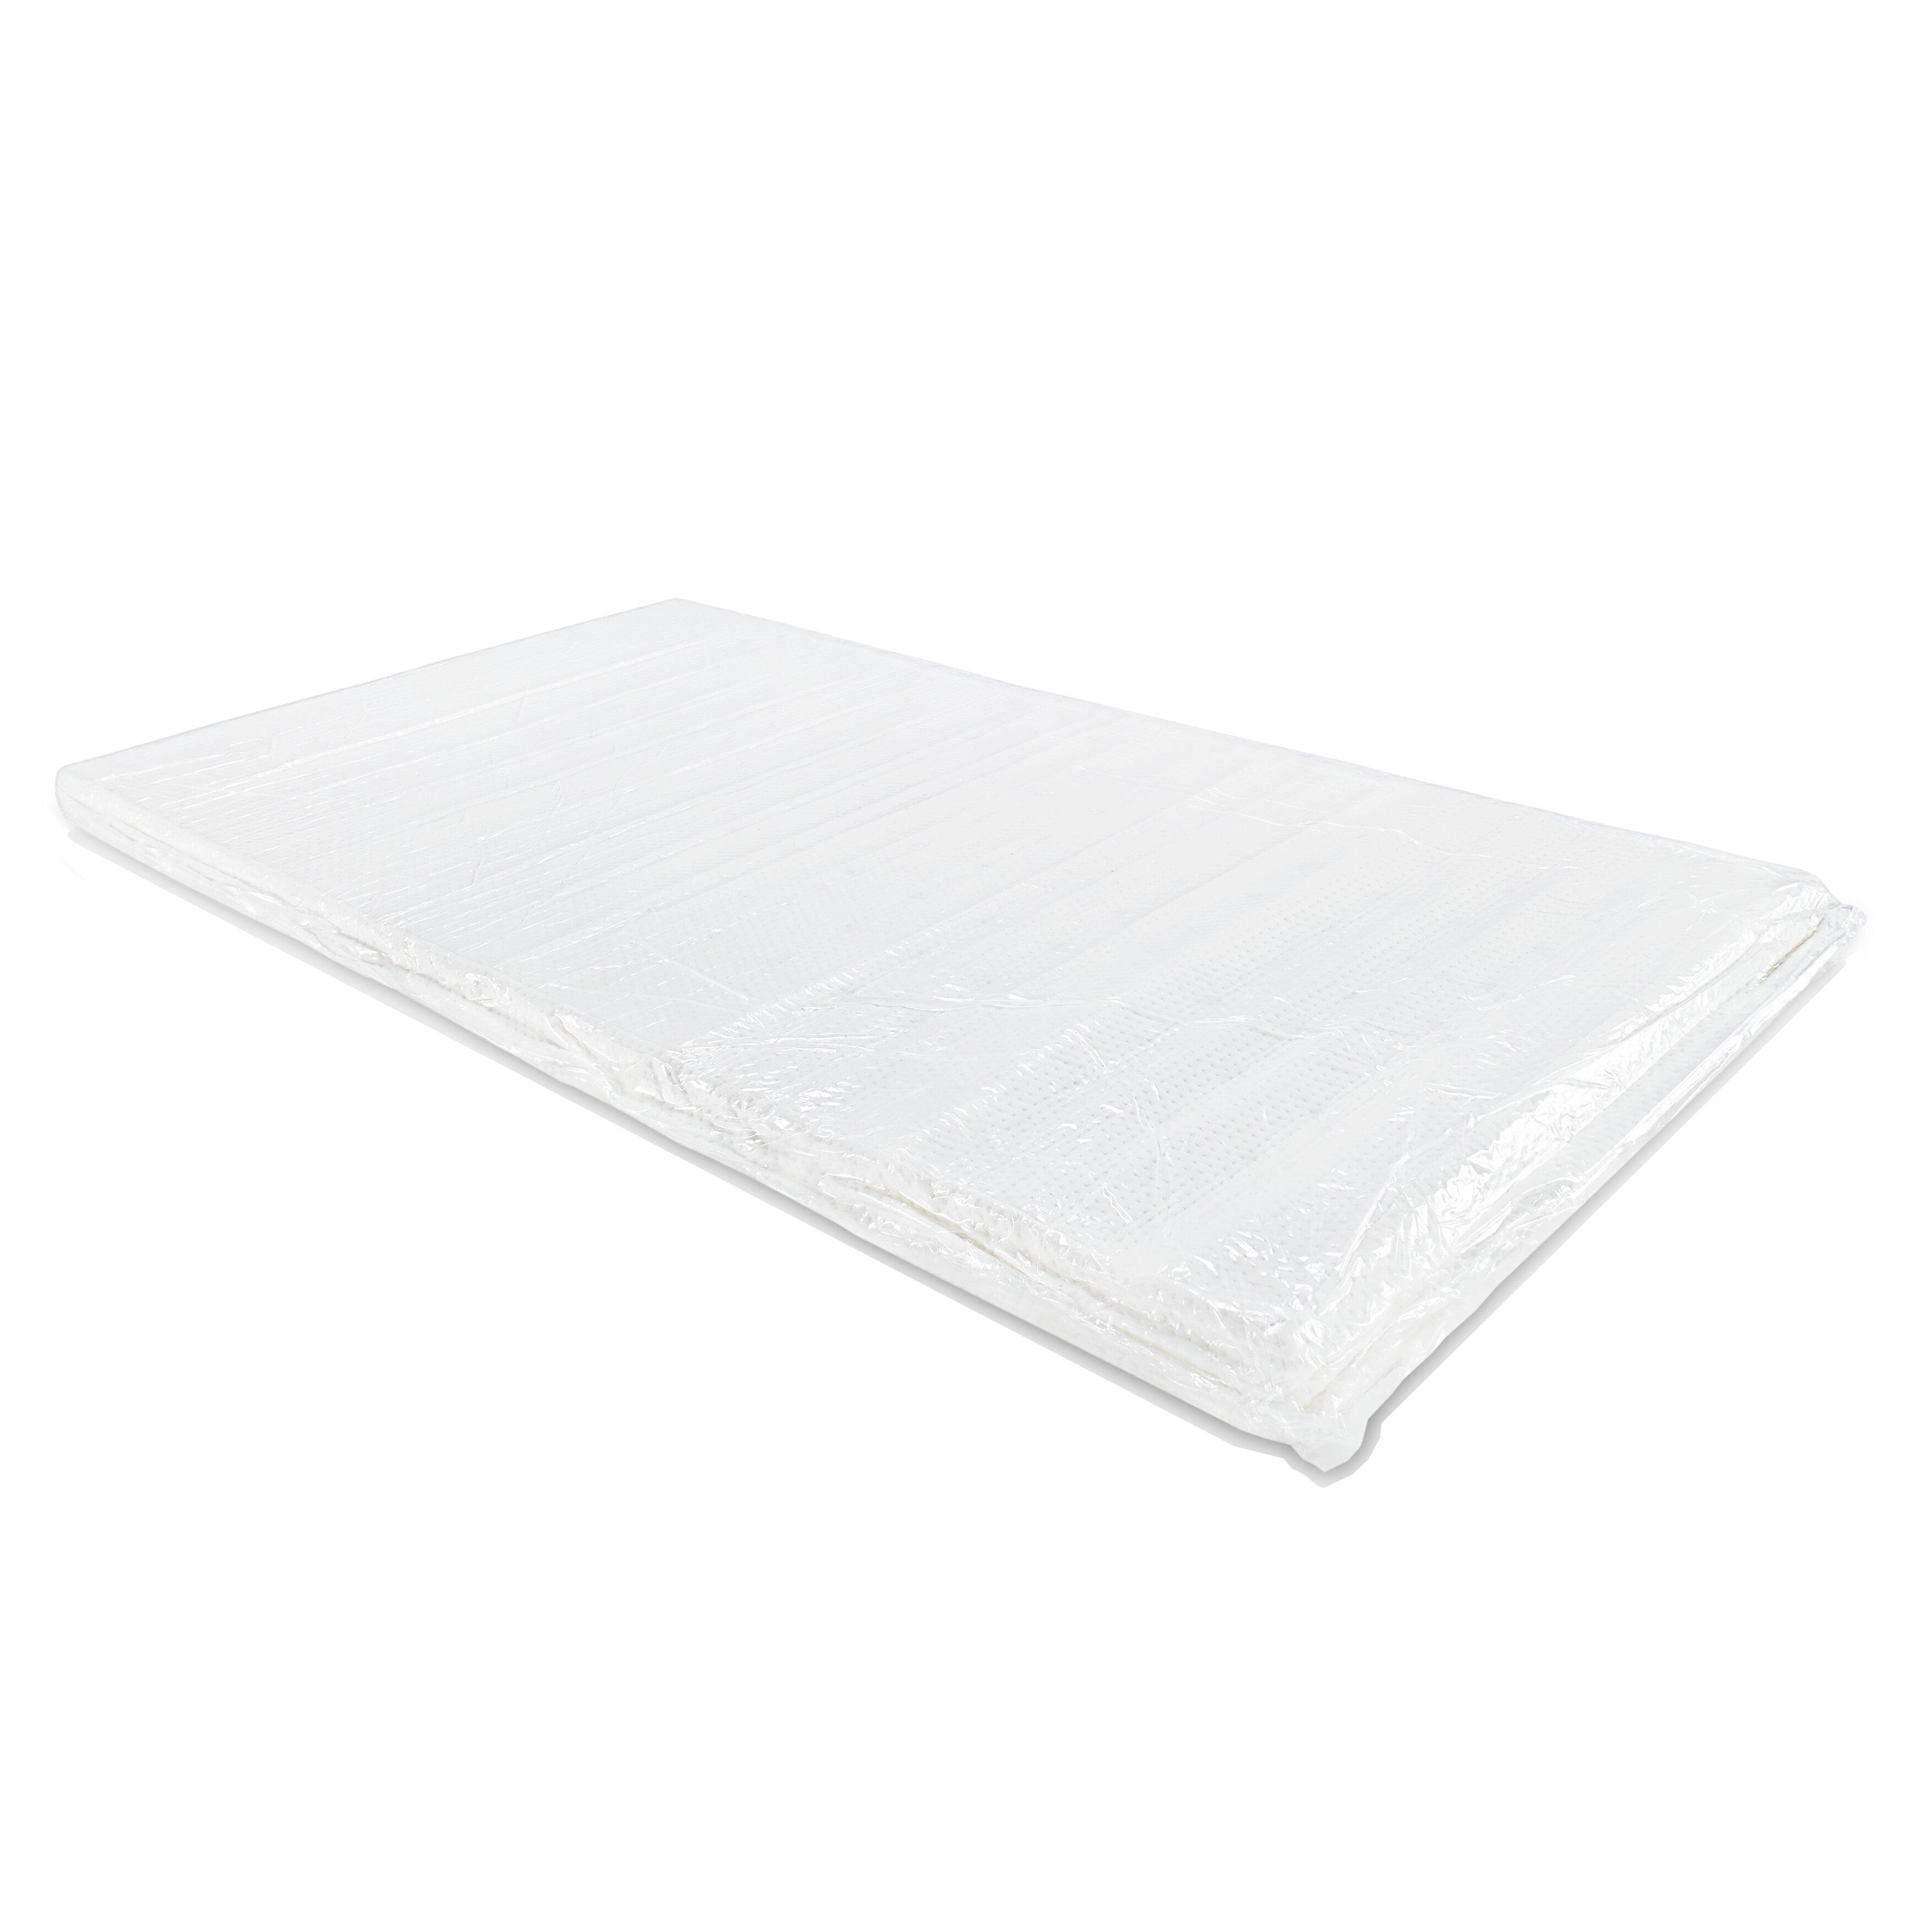 Graco Premium Foam Crib And Toddler Bed Mattress Reviews